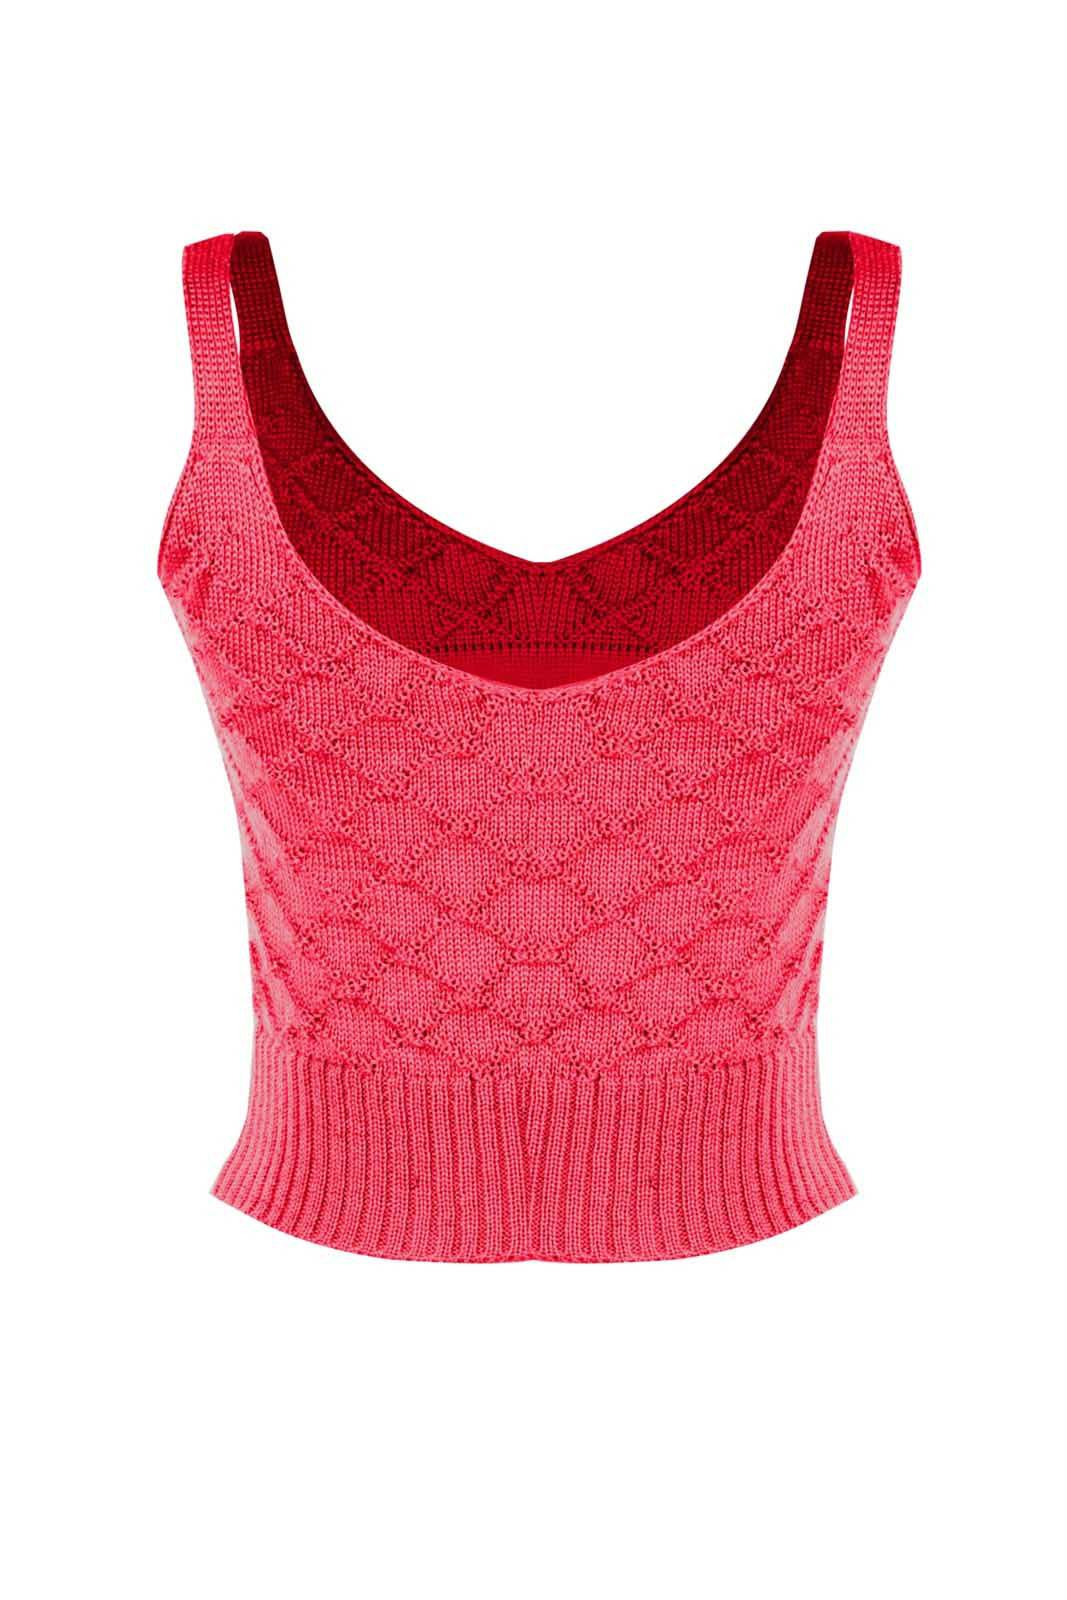 Top Outlet Dri Cropped Tricot Estampado Estampa DimDimDim Pink